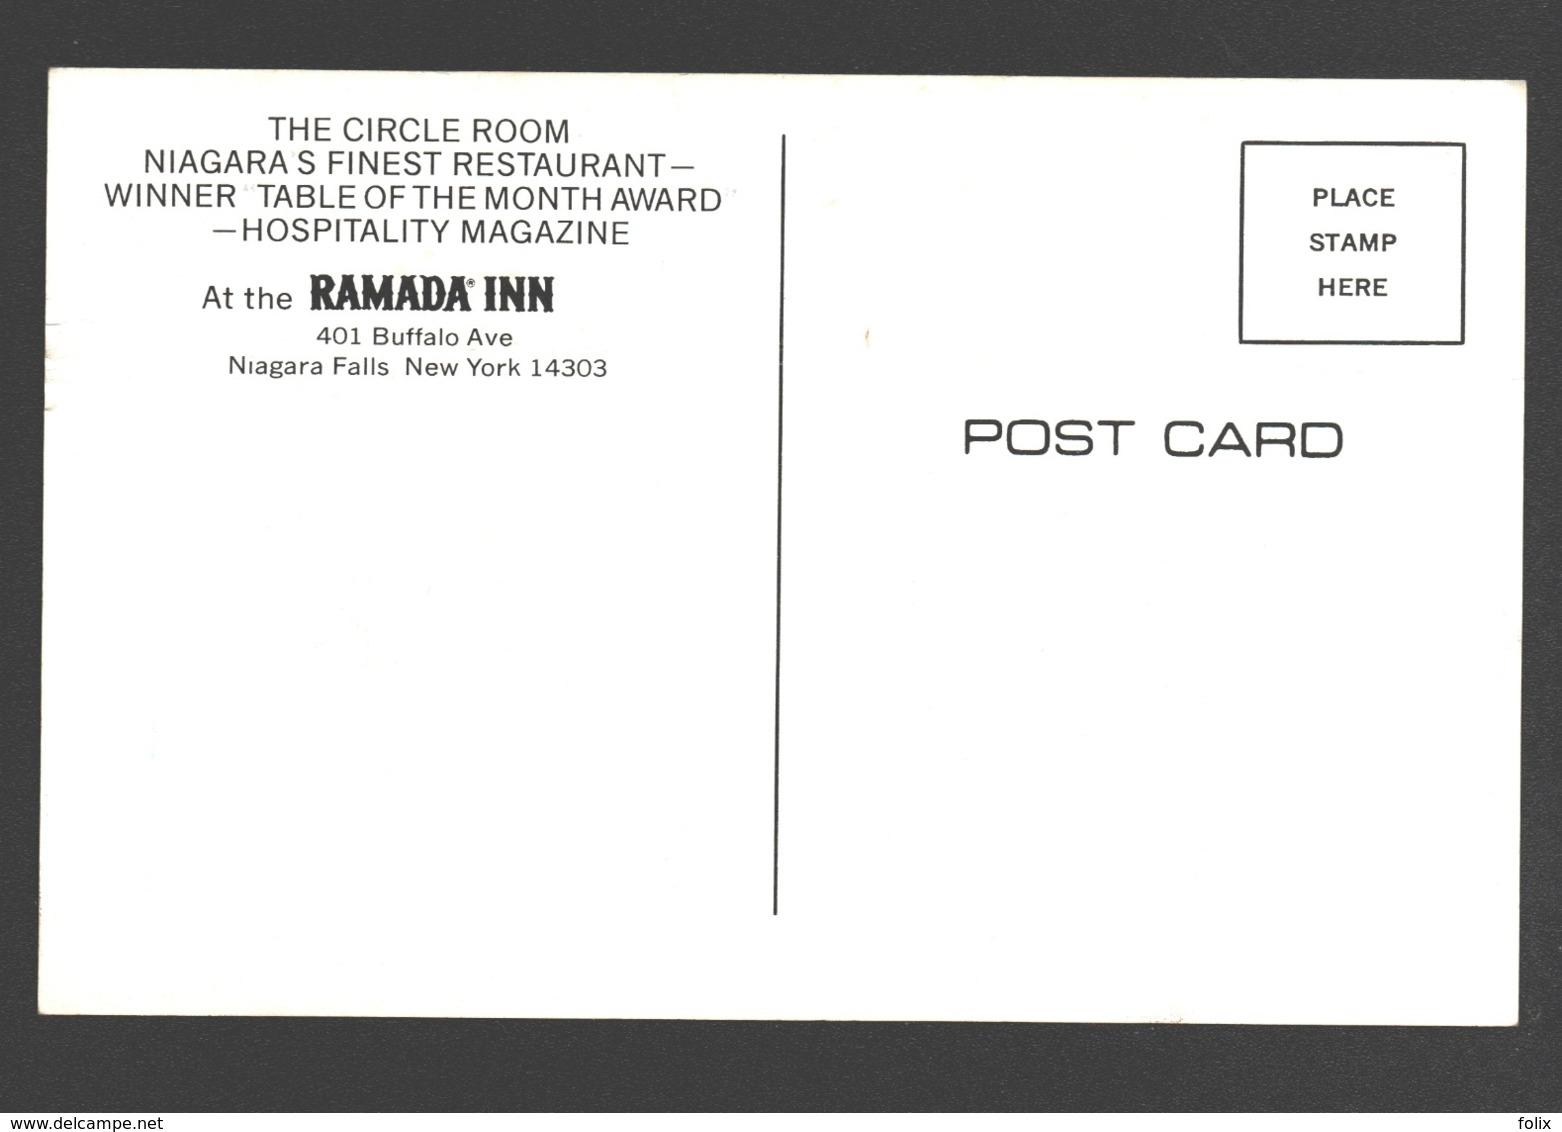 Niagara Falls - Ramada Inn - Winner 'Table Of The Month Award - Hospitality Magazine' - Zonder Classificatie